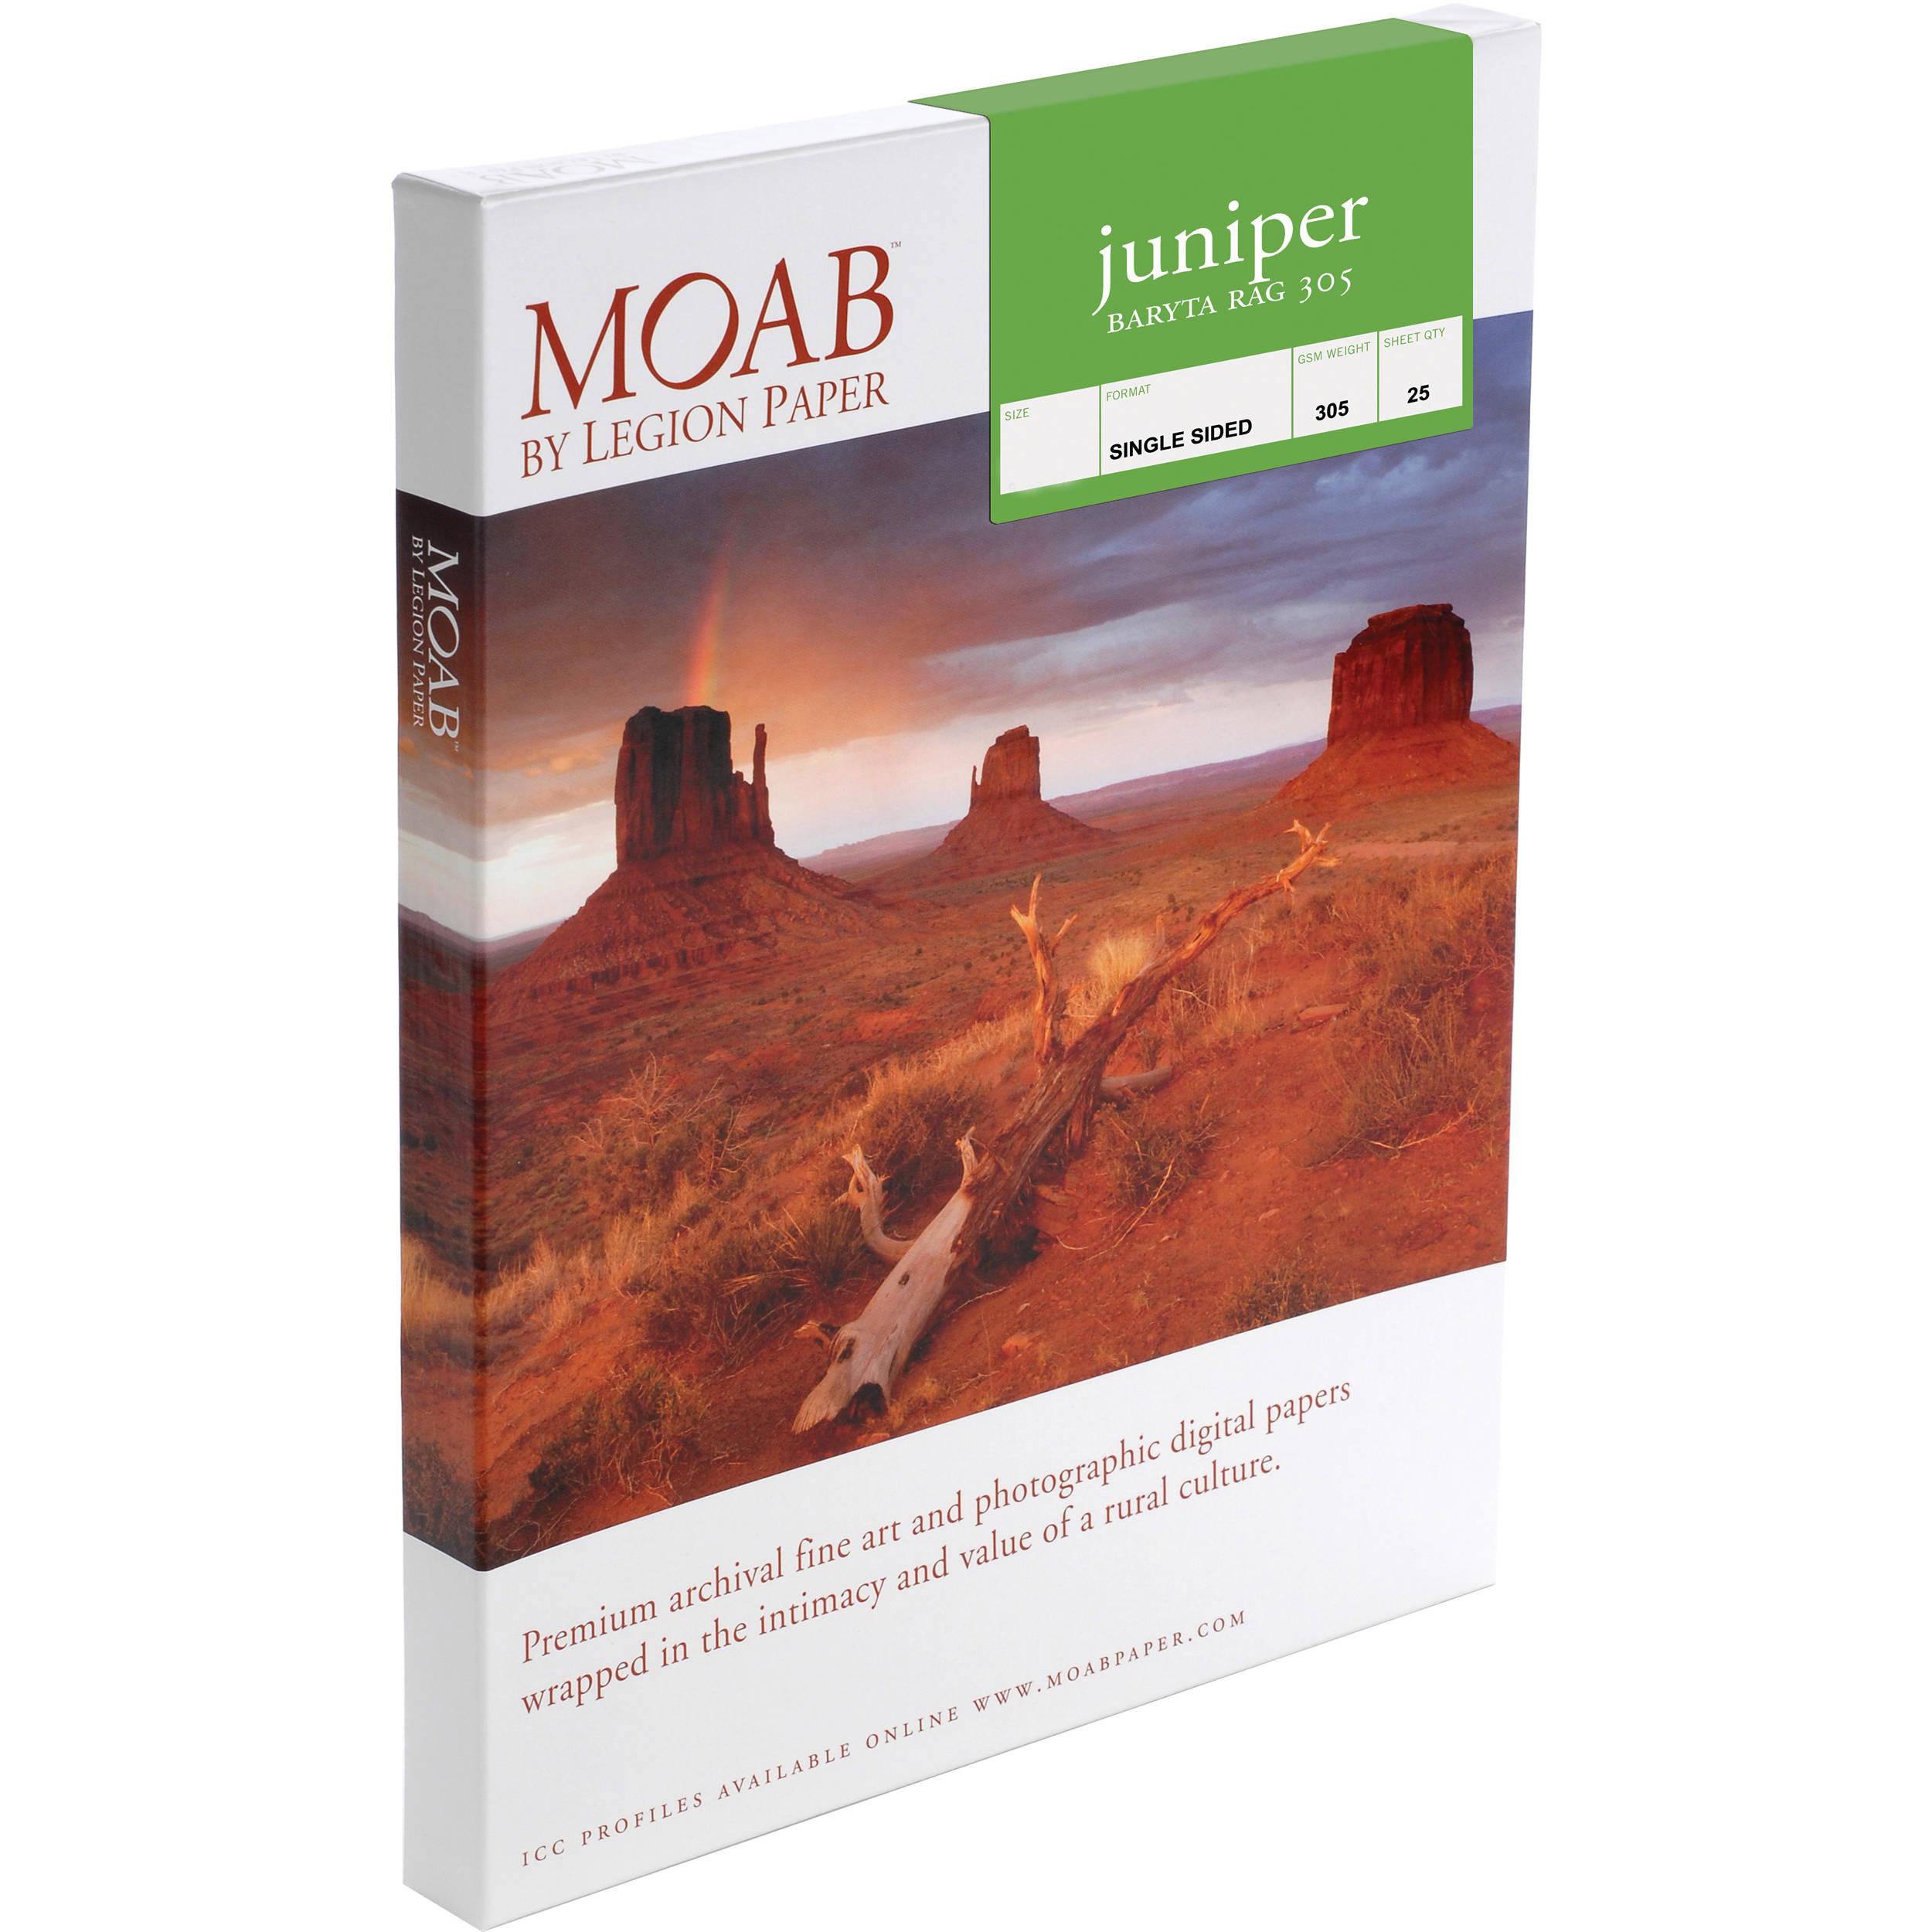 7556f1638d2c7 Moab Juniper Baryta Rag 305 Paper F01-JBR305131925 B H Photo